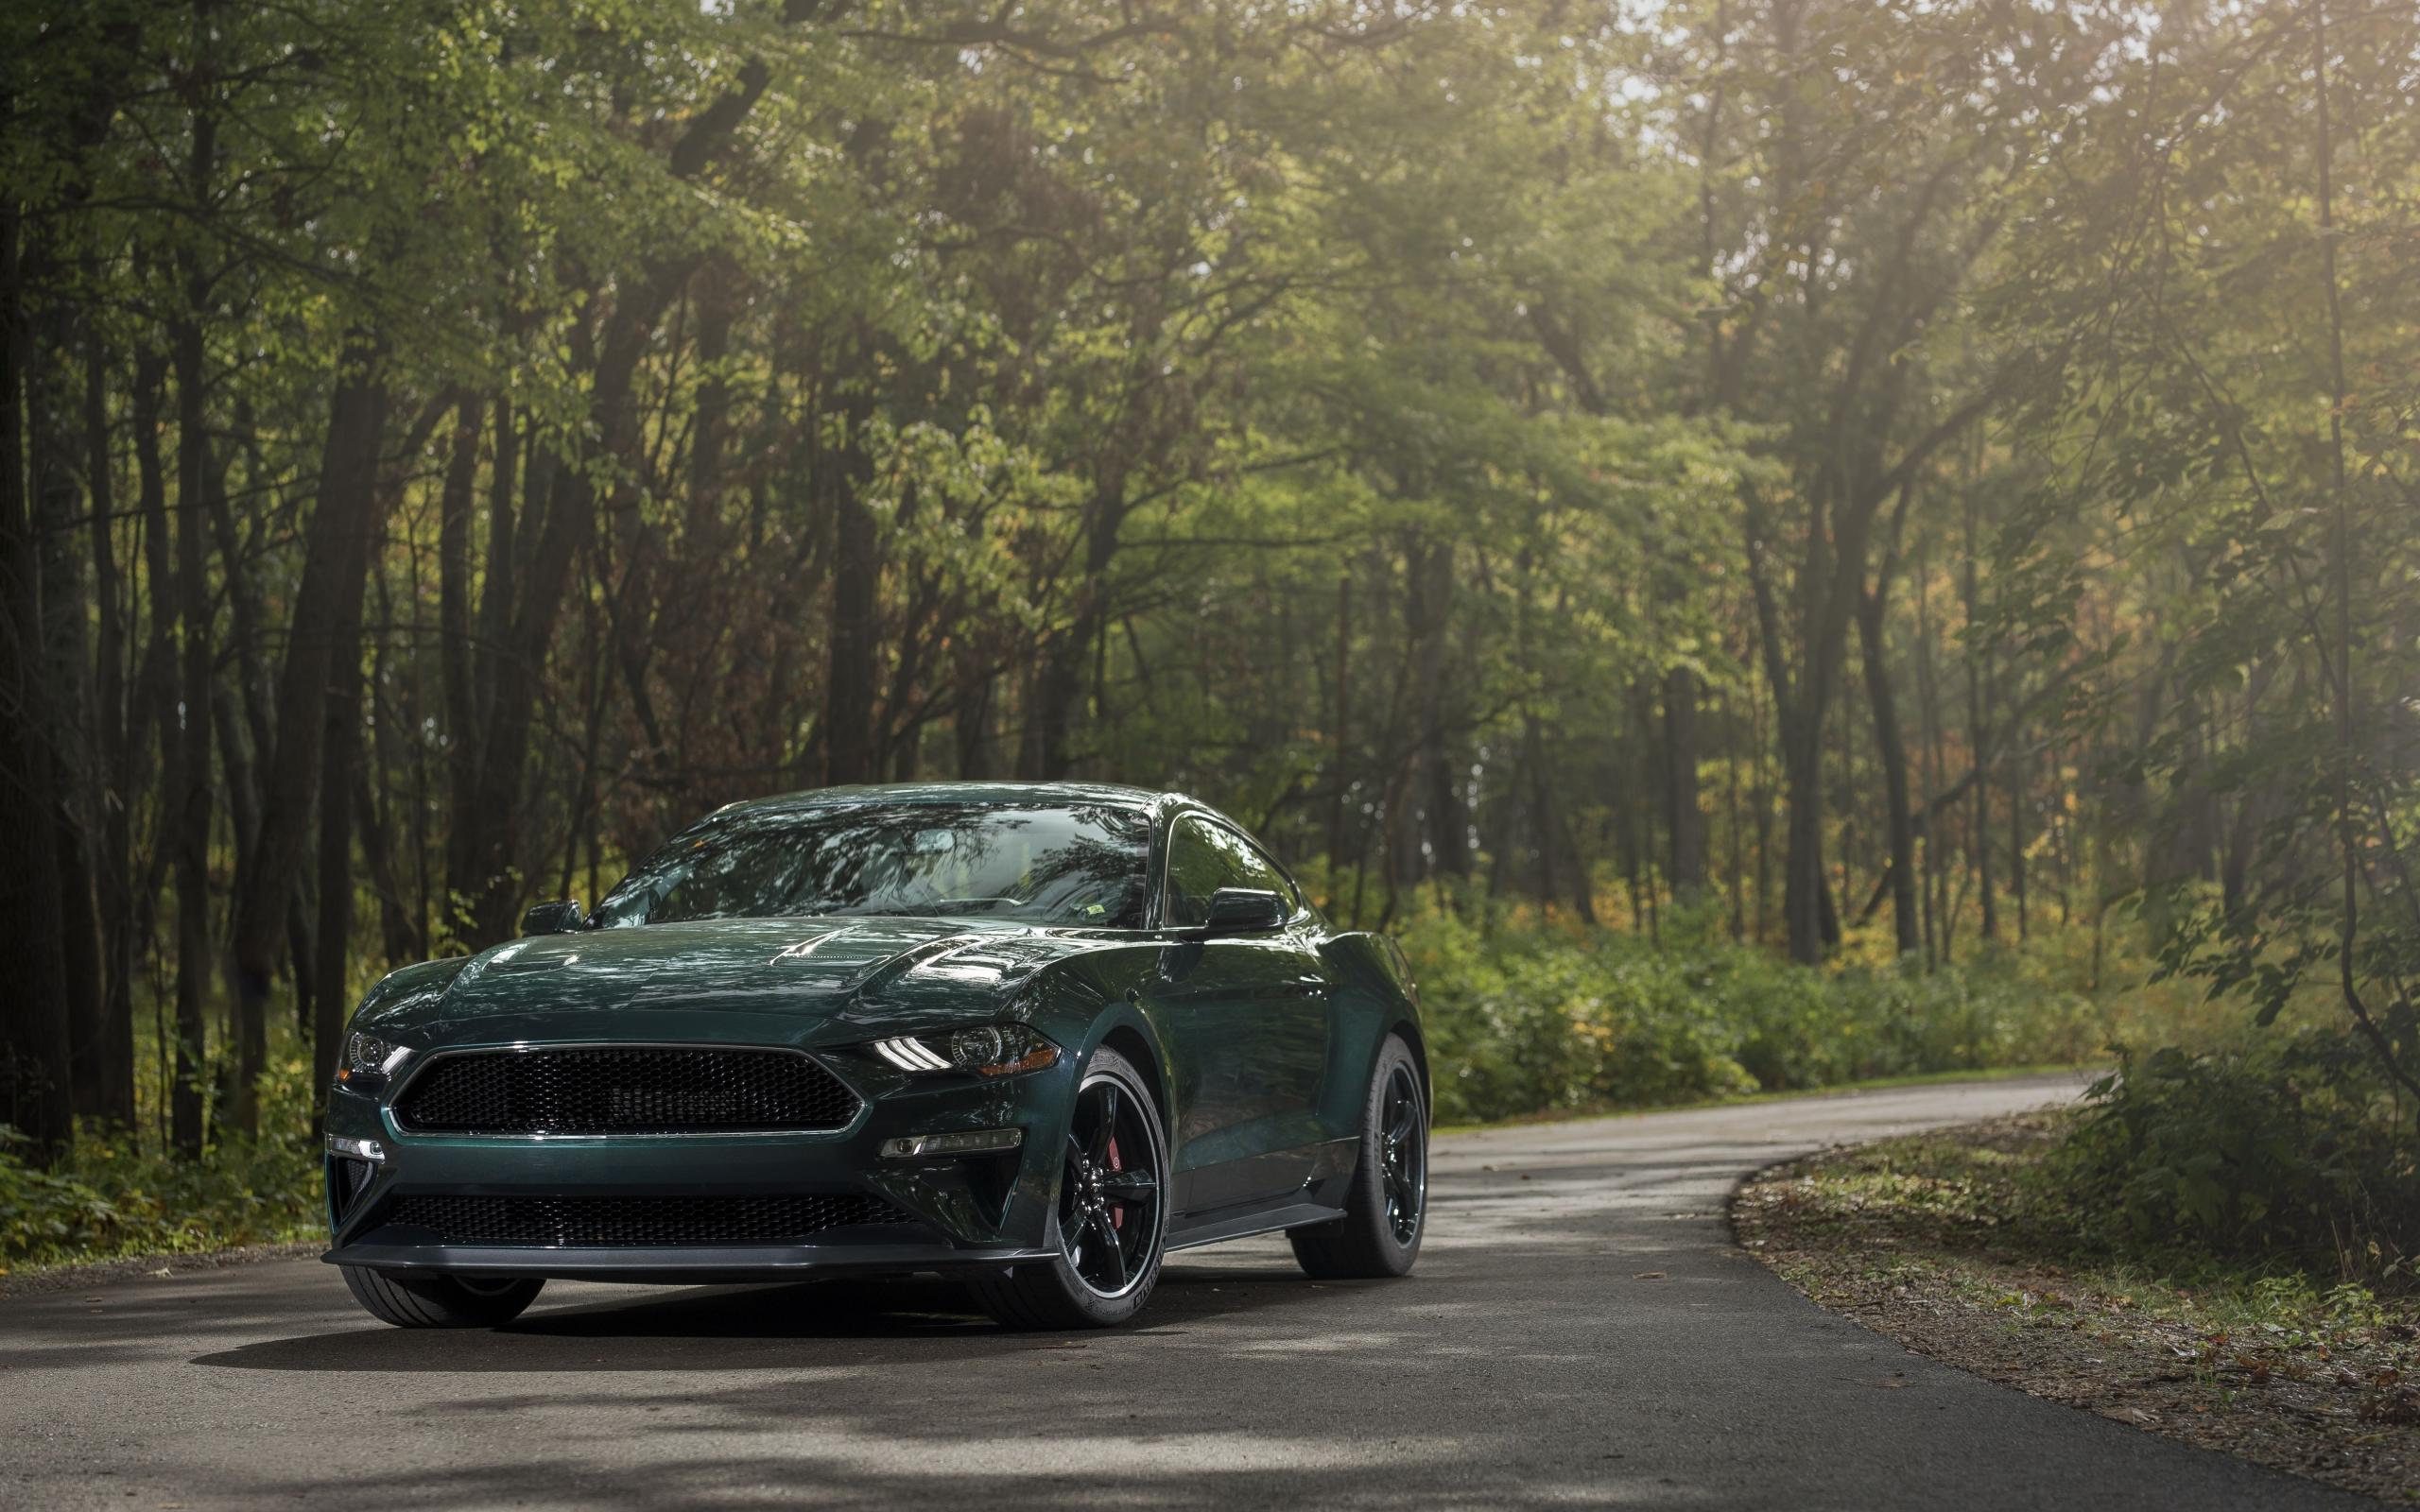 Wallpaper of Car Ford Mustang Bullitt Green Car Muscle Car 2560x1600